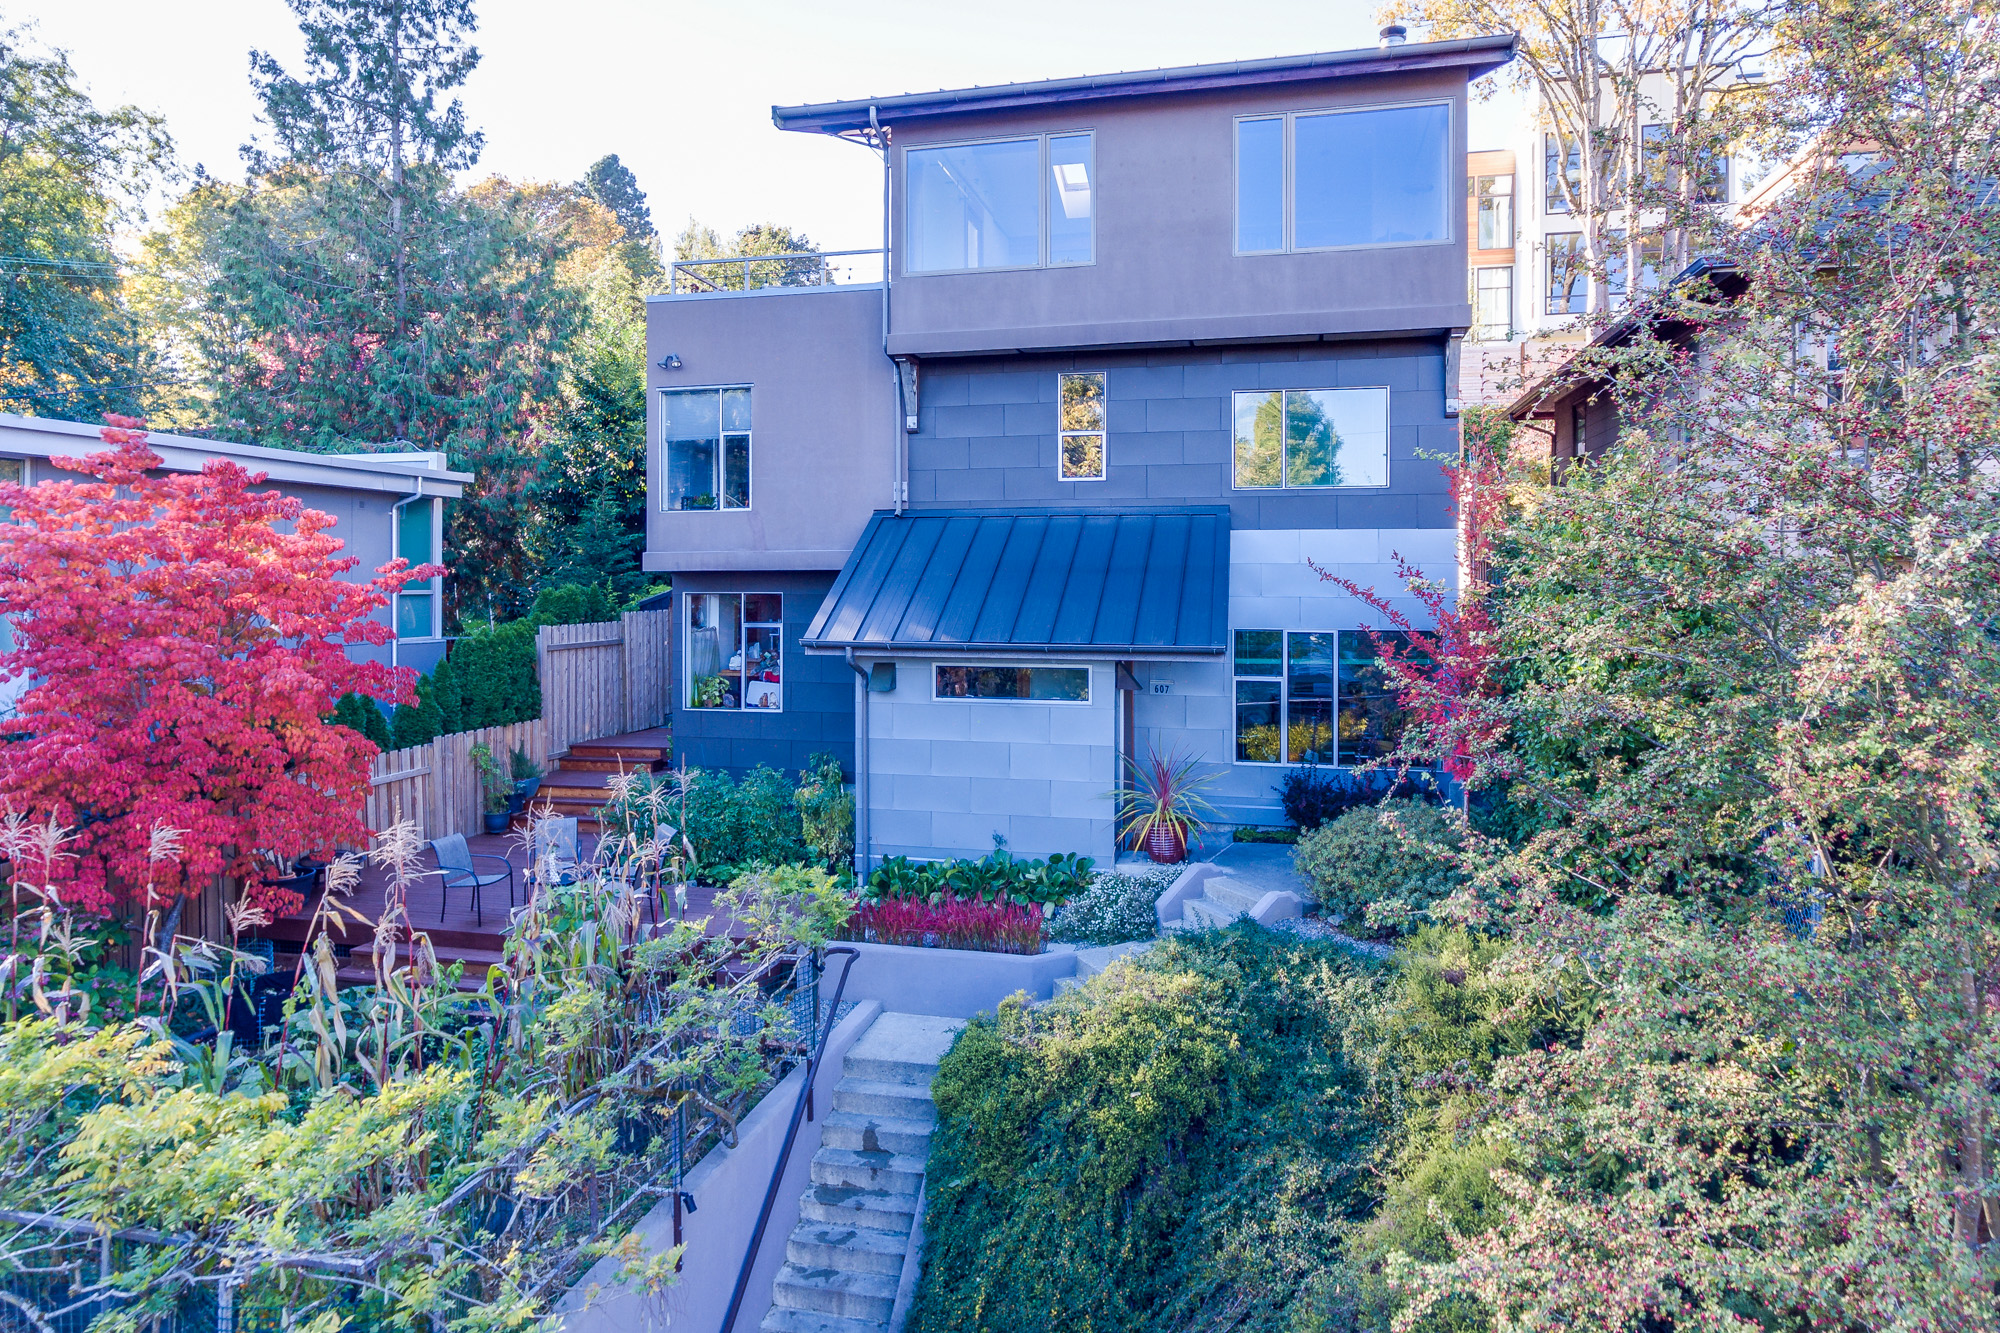 Real Estate Listings Archives - EastsideHomes.com